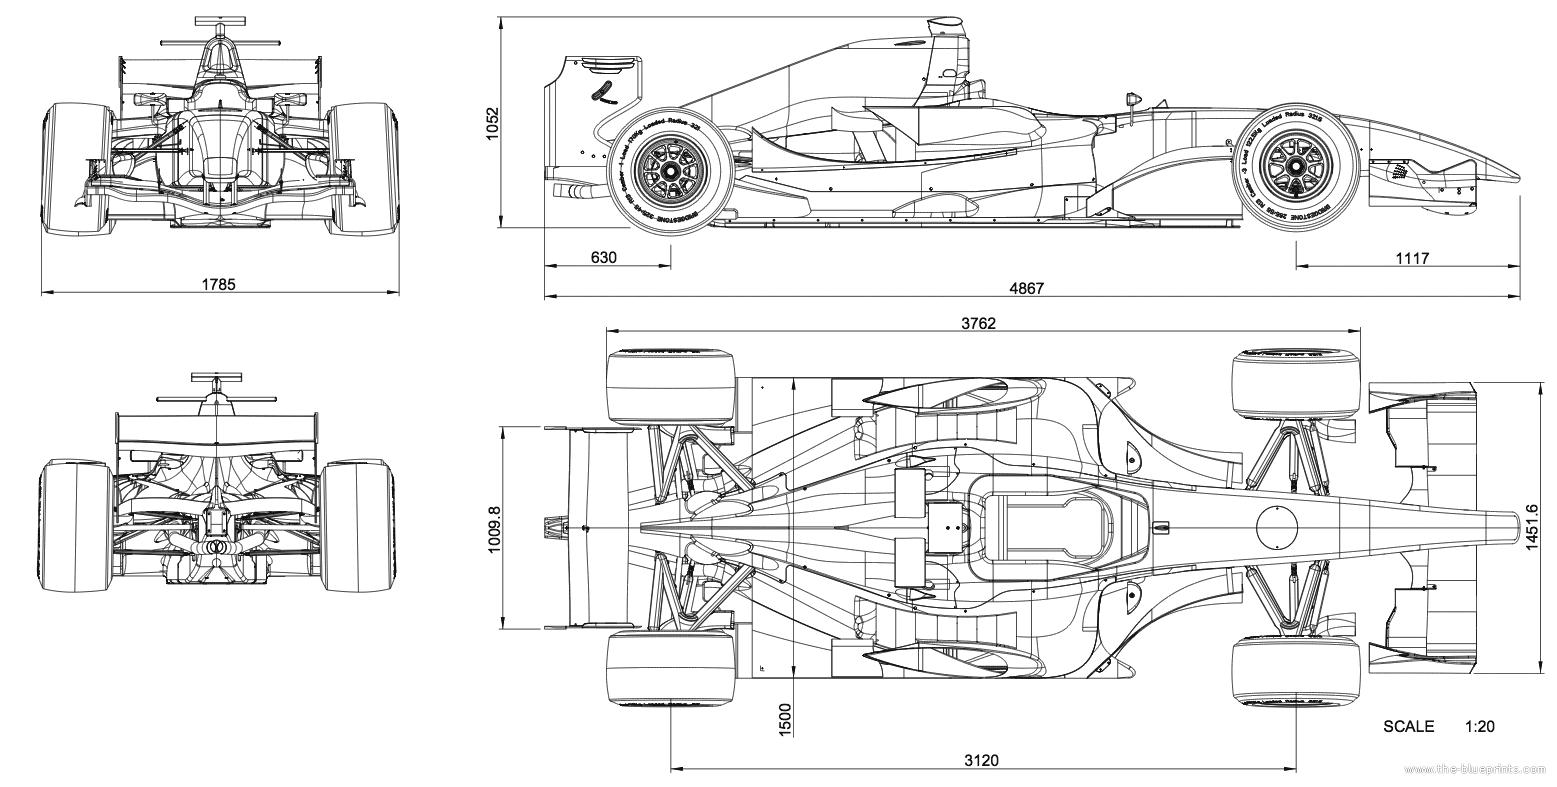 medium resolution of dallara gp208 dallas trafic cars and motorcycles concept racing floor plans